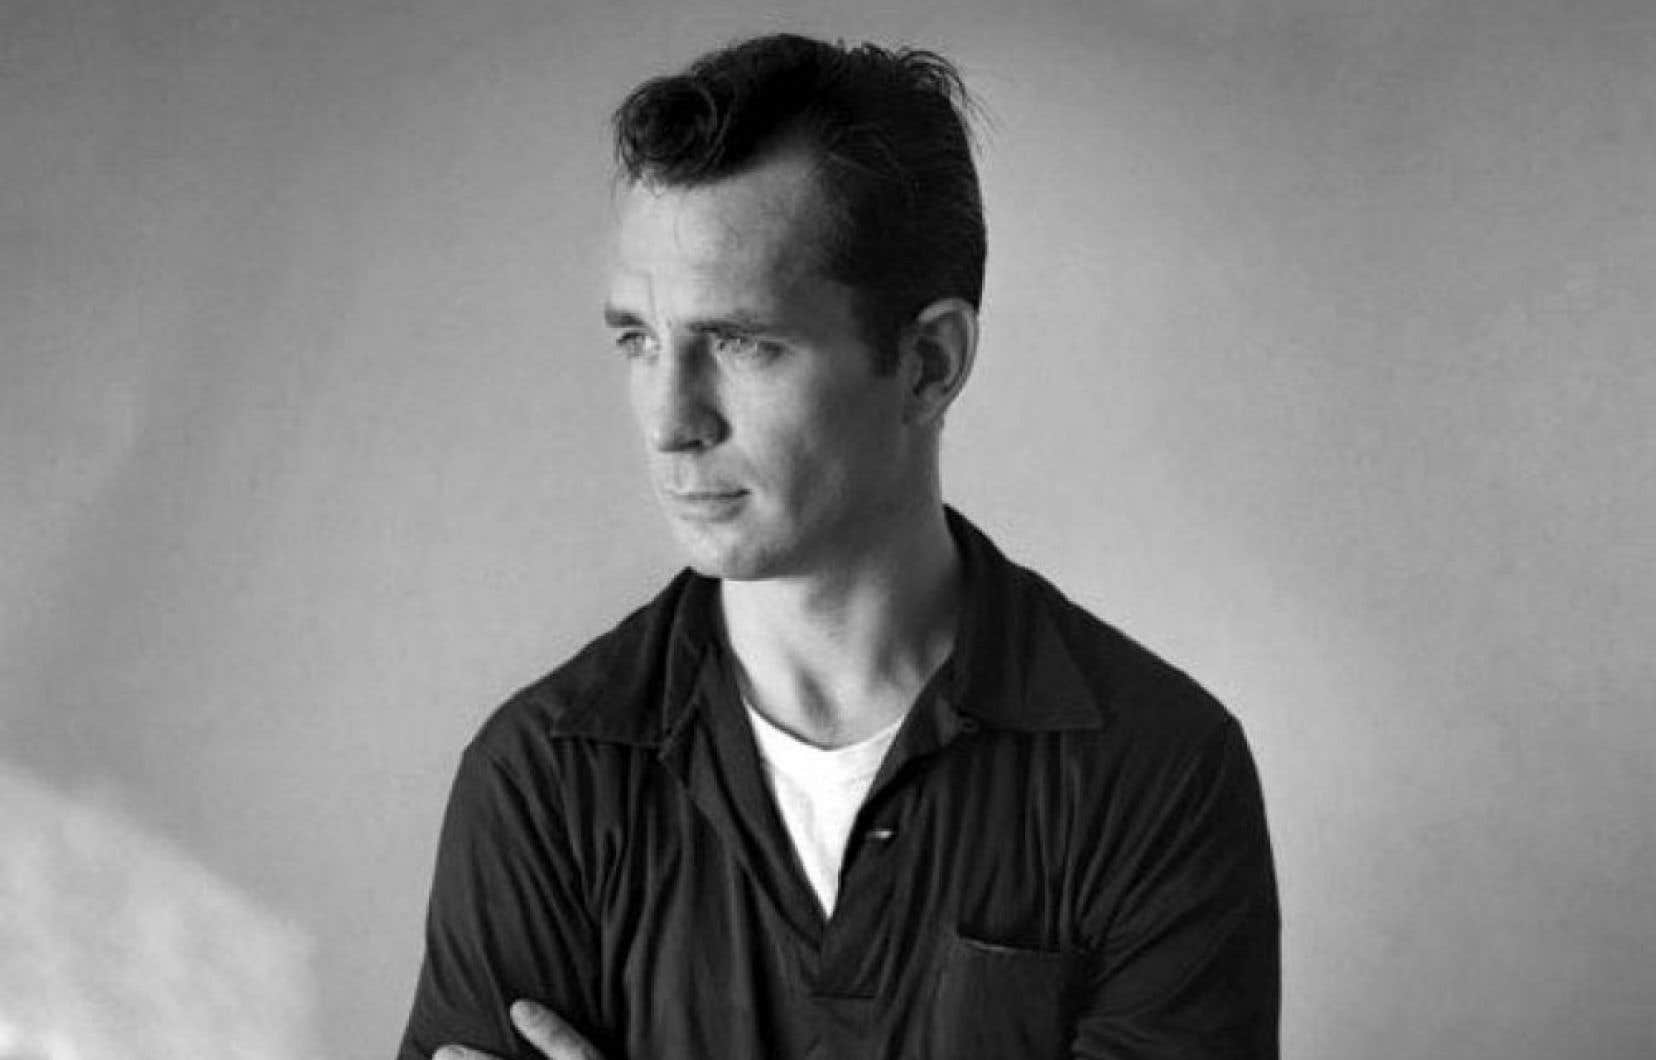 Jack Kerouac, par Tom Palumbo, vers 1956